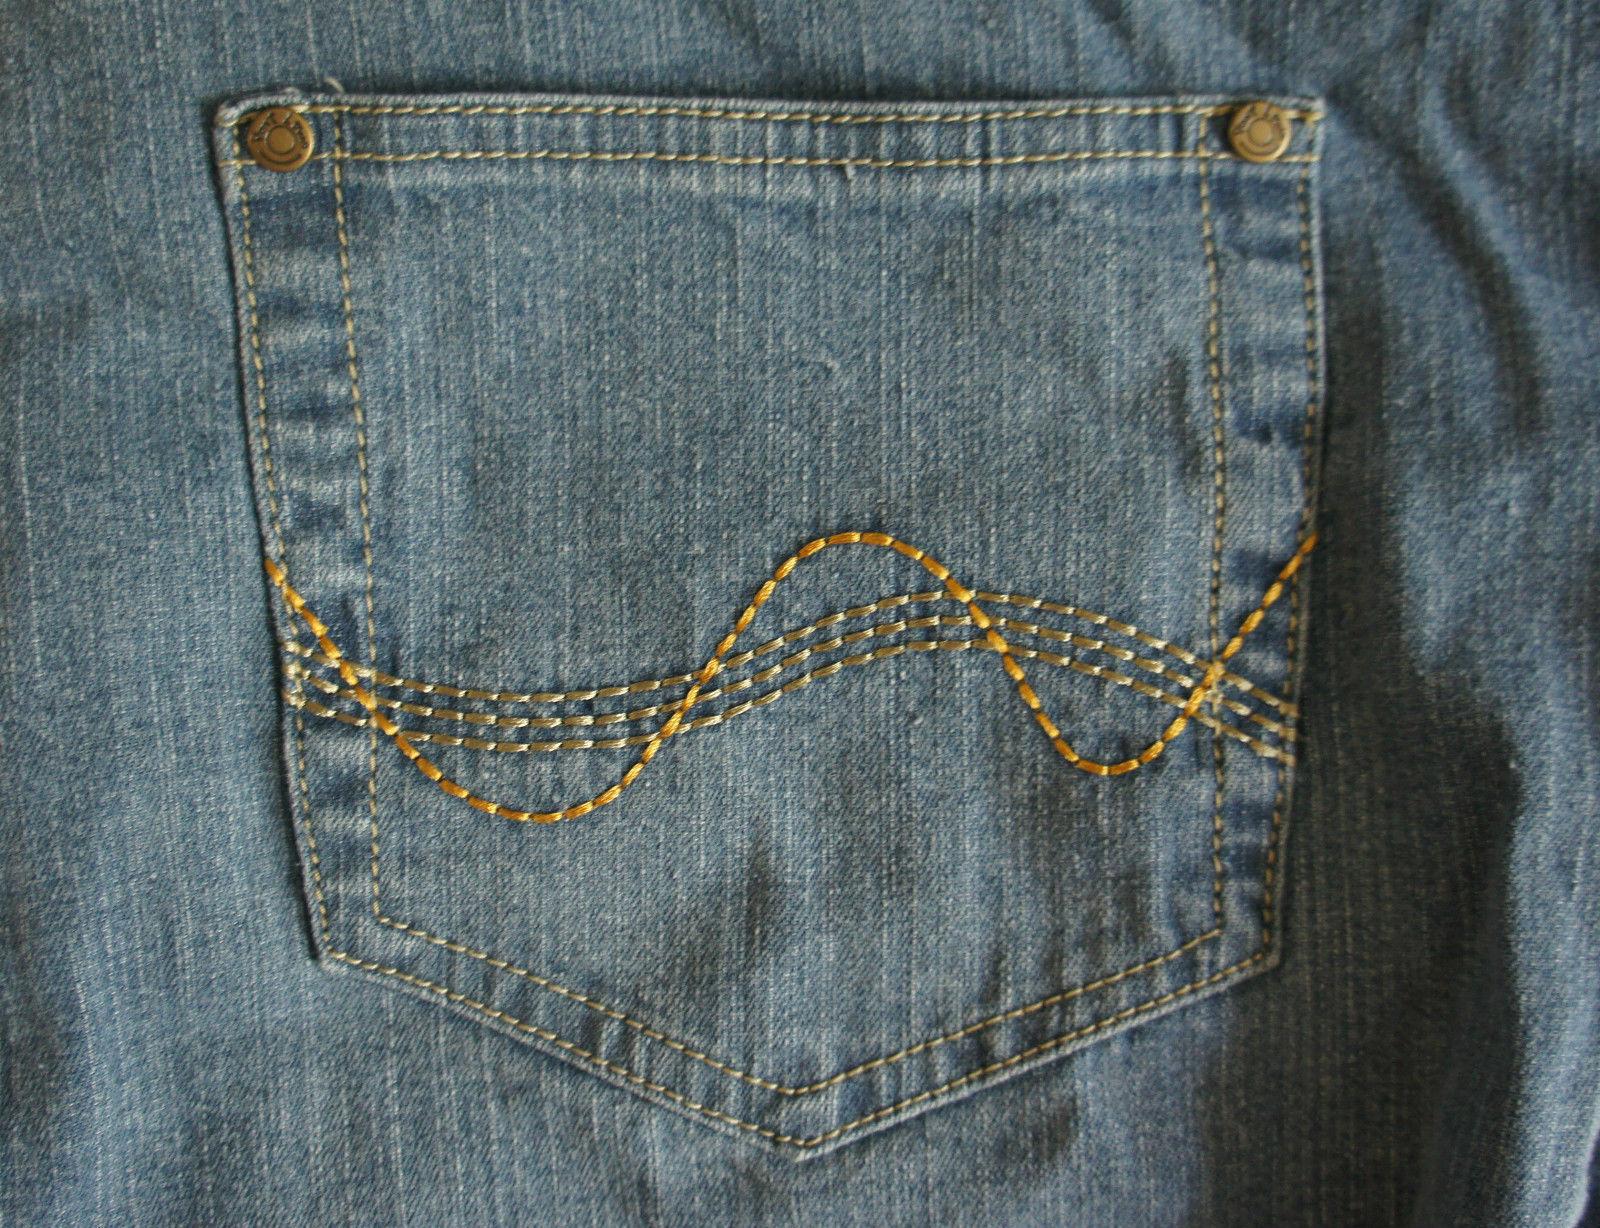 Damen-Stretch-Jeans-9-versch-Modelle-Jeanshose-Hose-Elasthan-bequem-Oko-Tex Indexbild 21